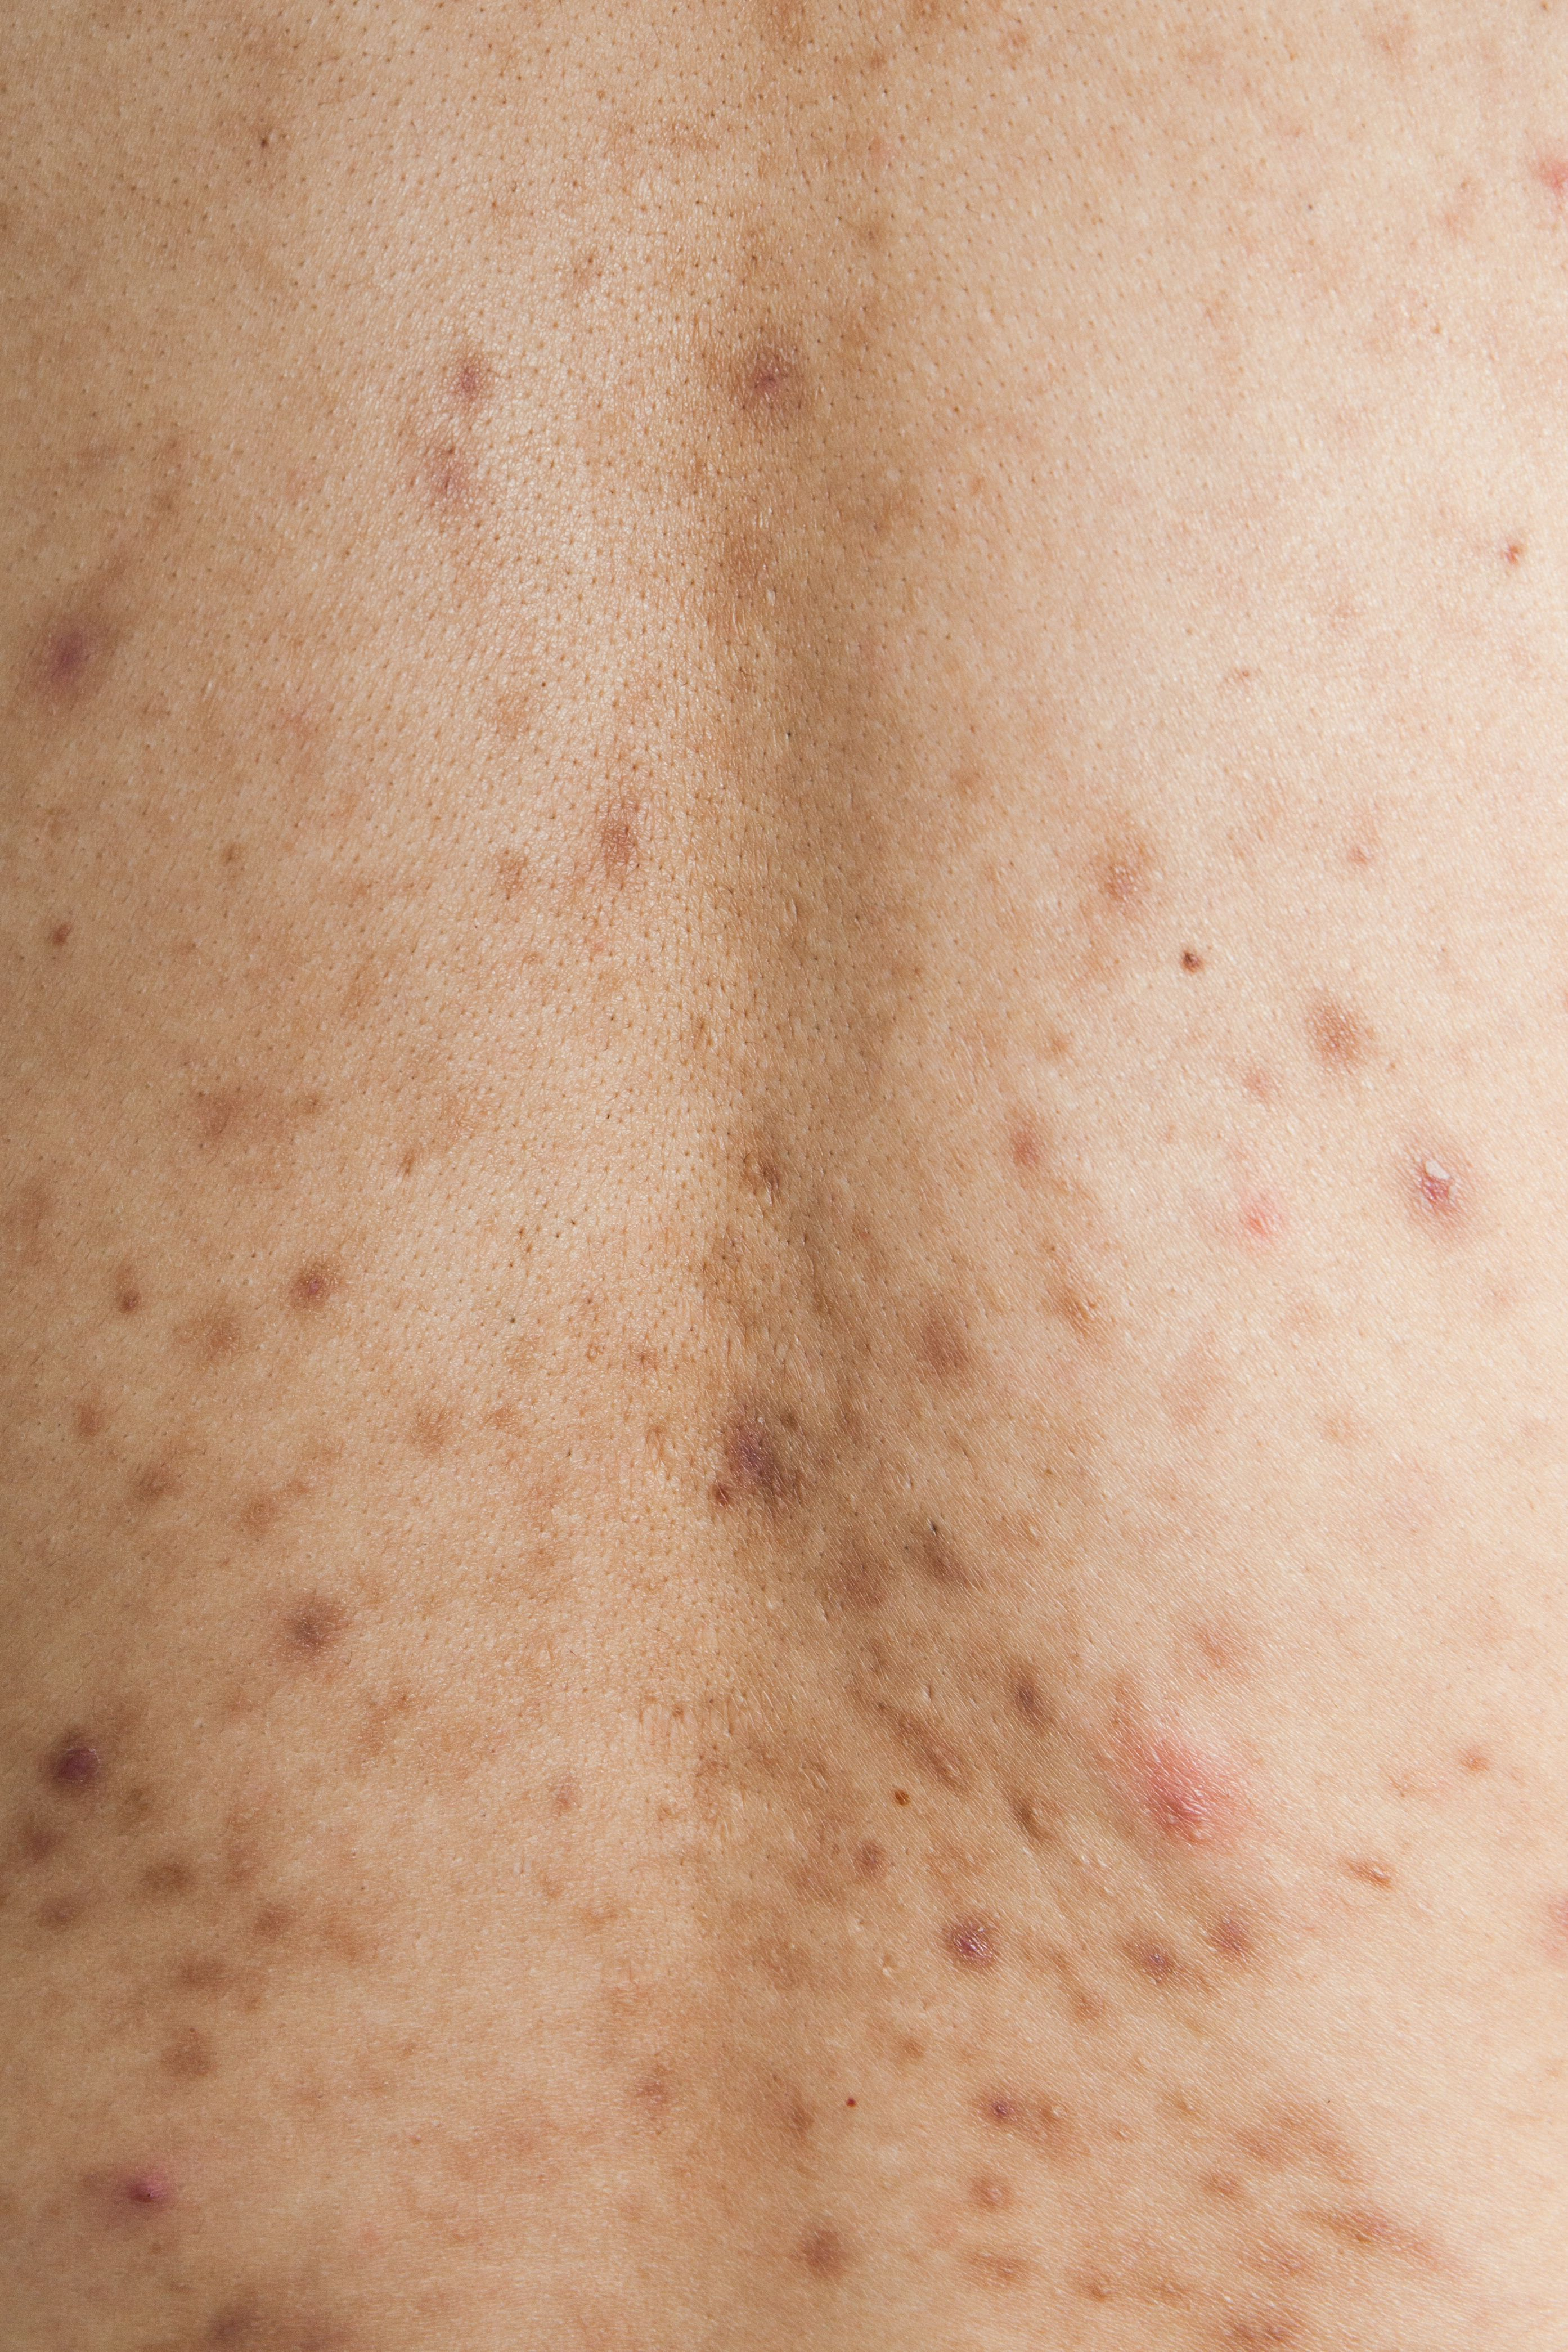 7b446aa489ba3d821c862b7a953822f6 - How To Get Rid Of Post Inflammatory Hyperpigmentation Naturally